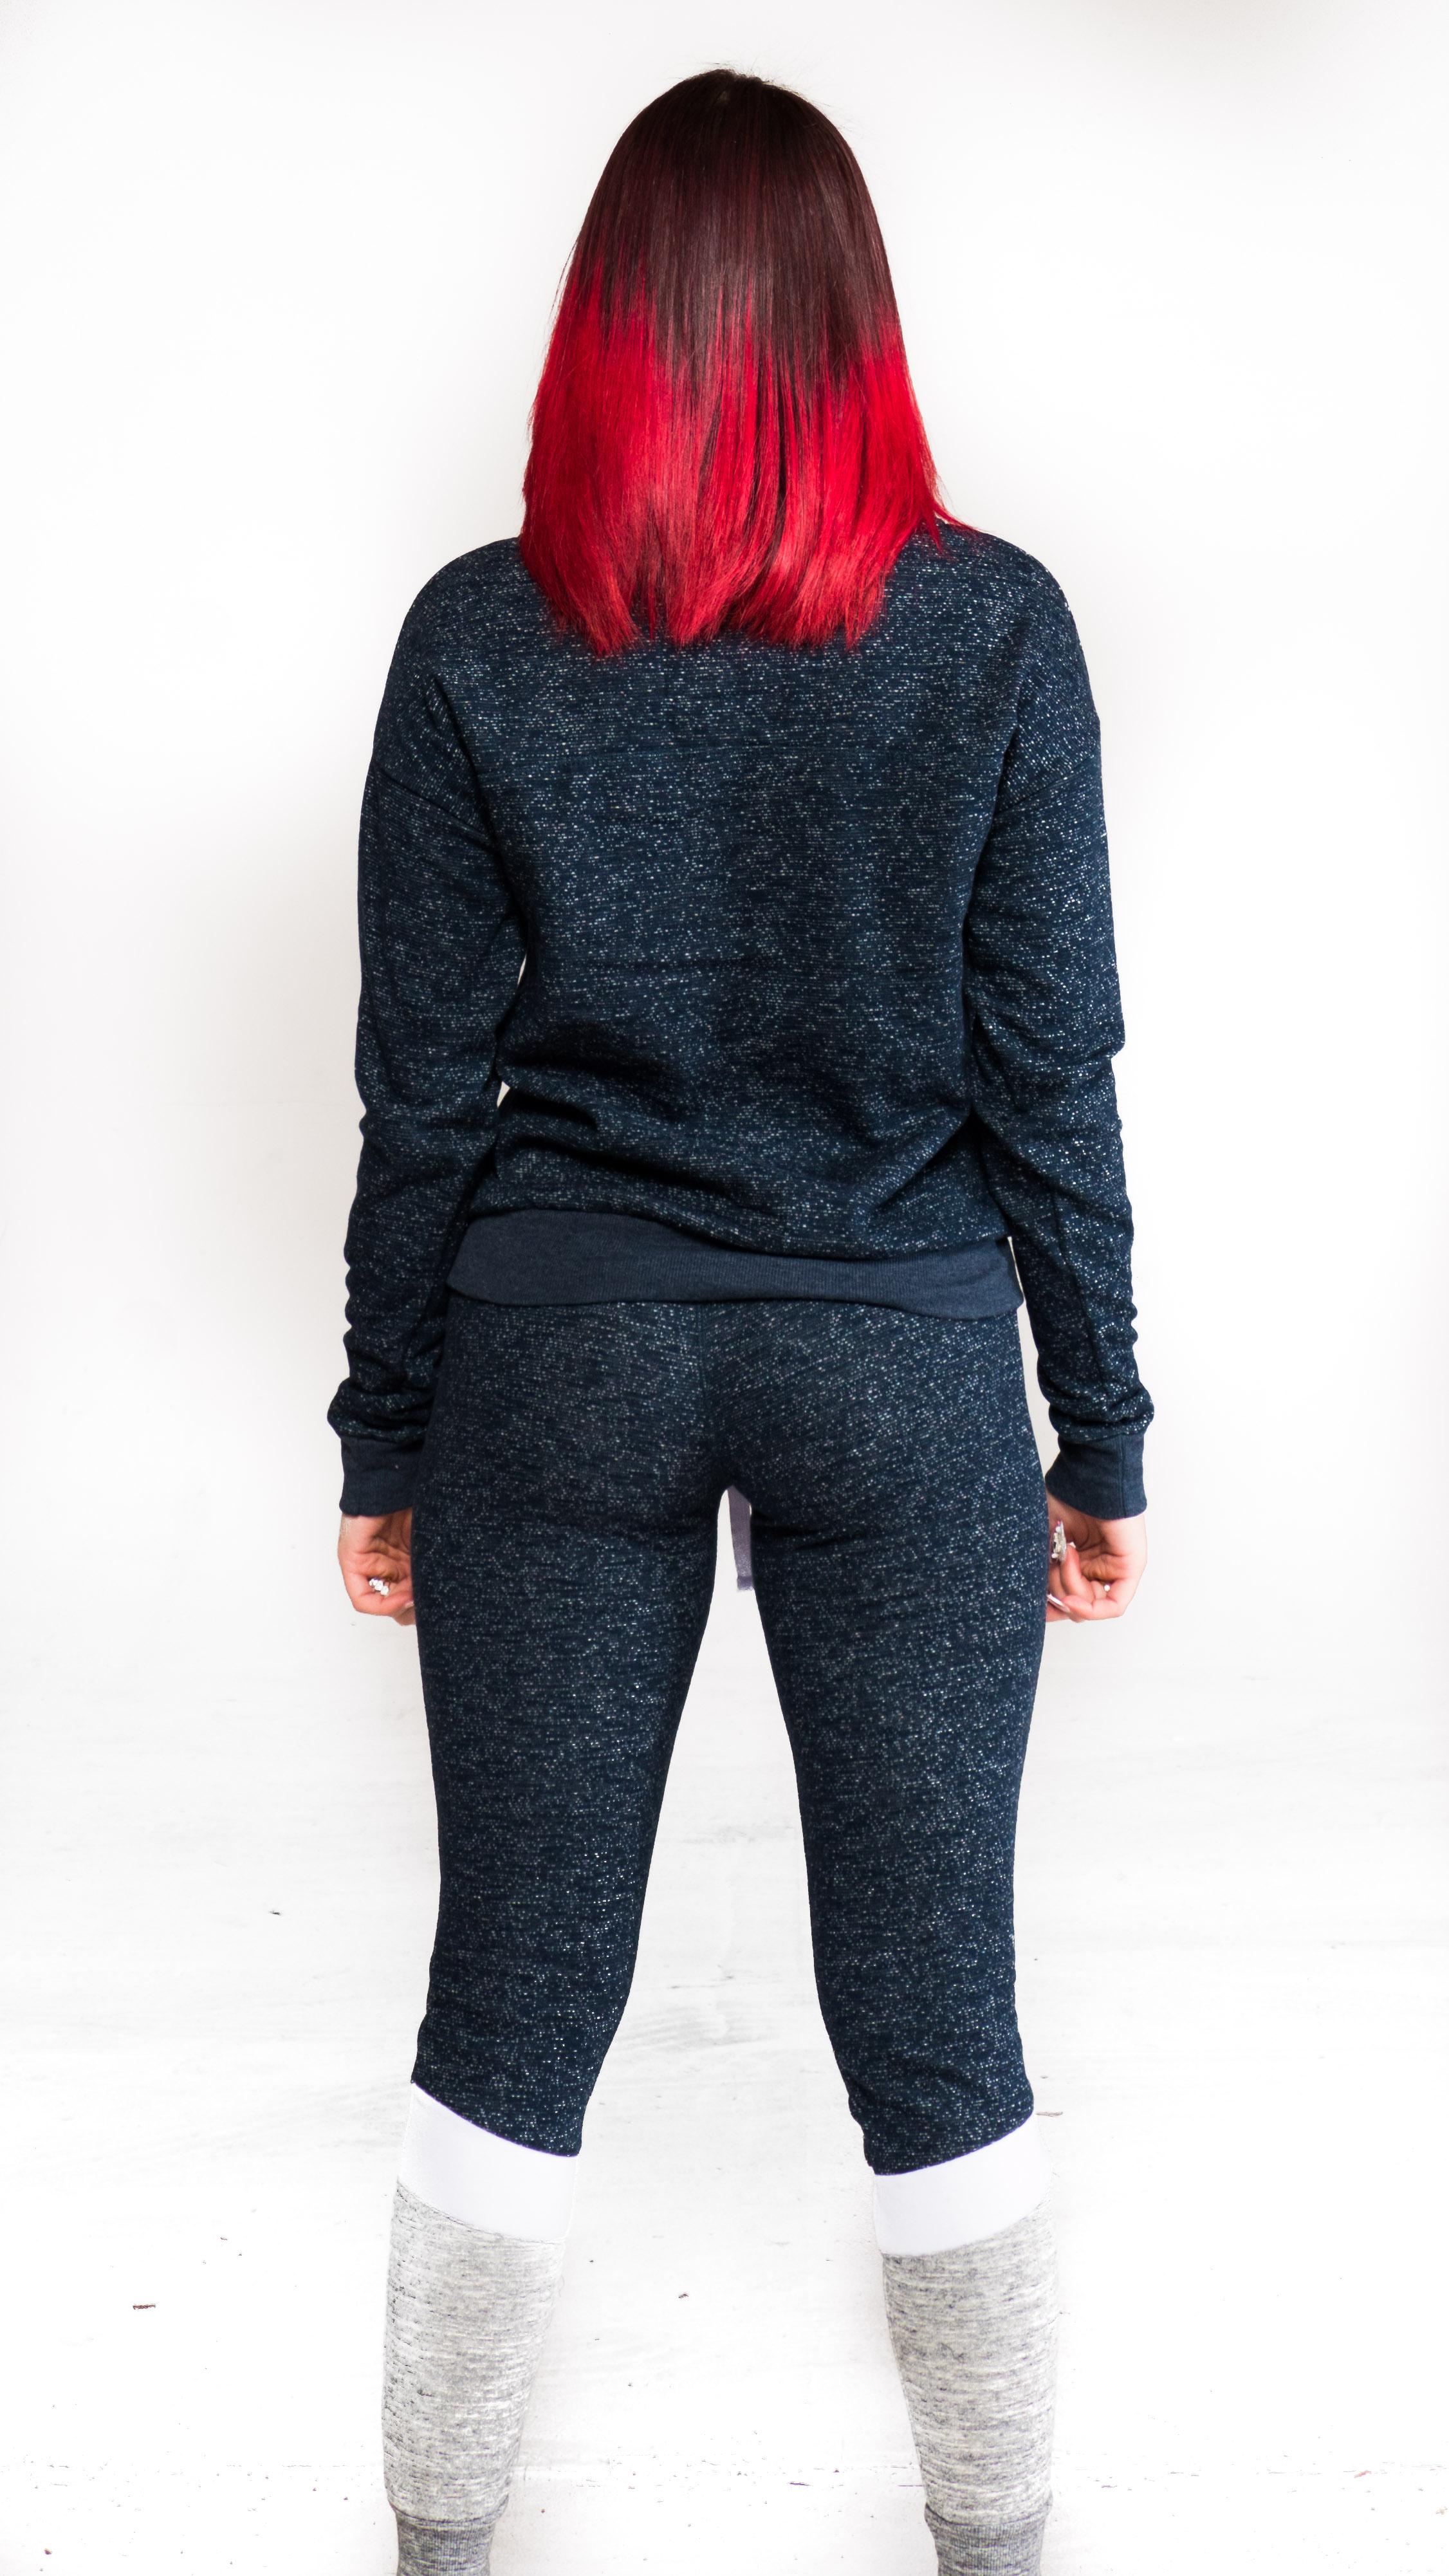 isis clothing - product shots-1580505.jpg